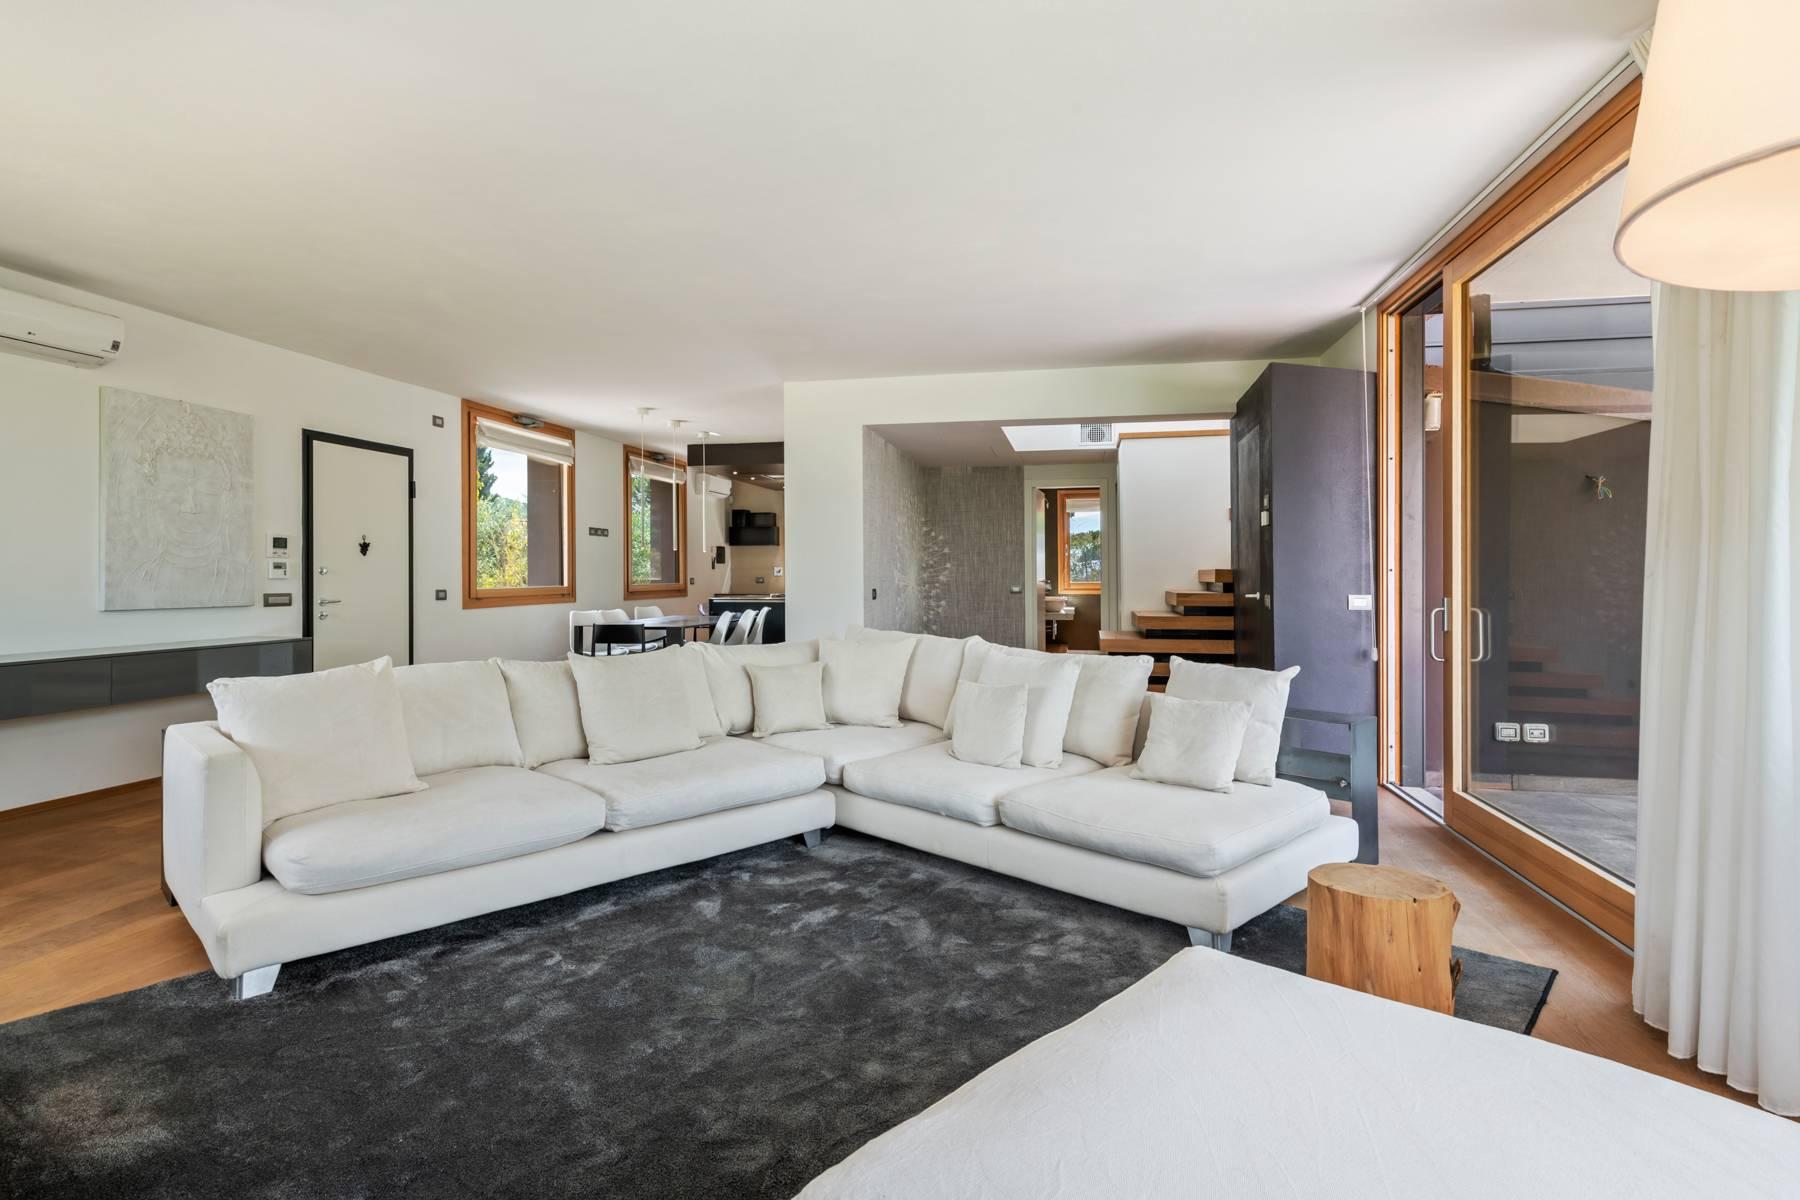 Appartamento in Vendita a Pontassieve: 5 locali, 300 mq - Foto 3